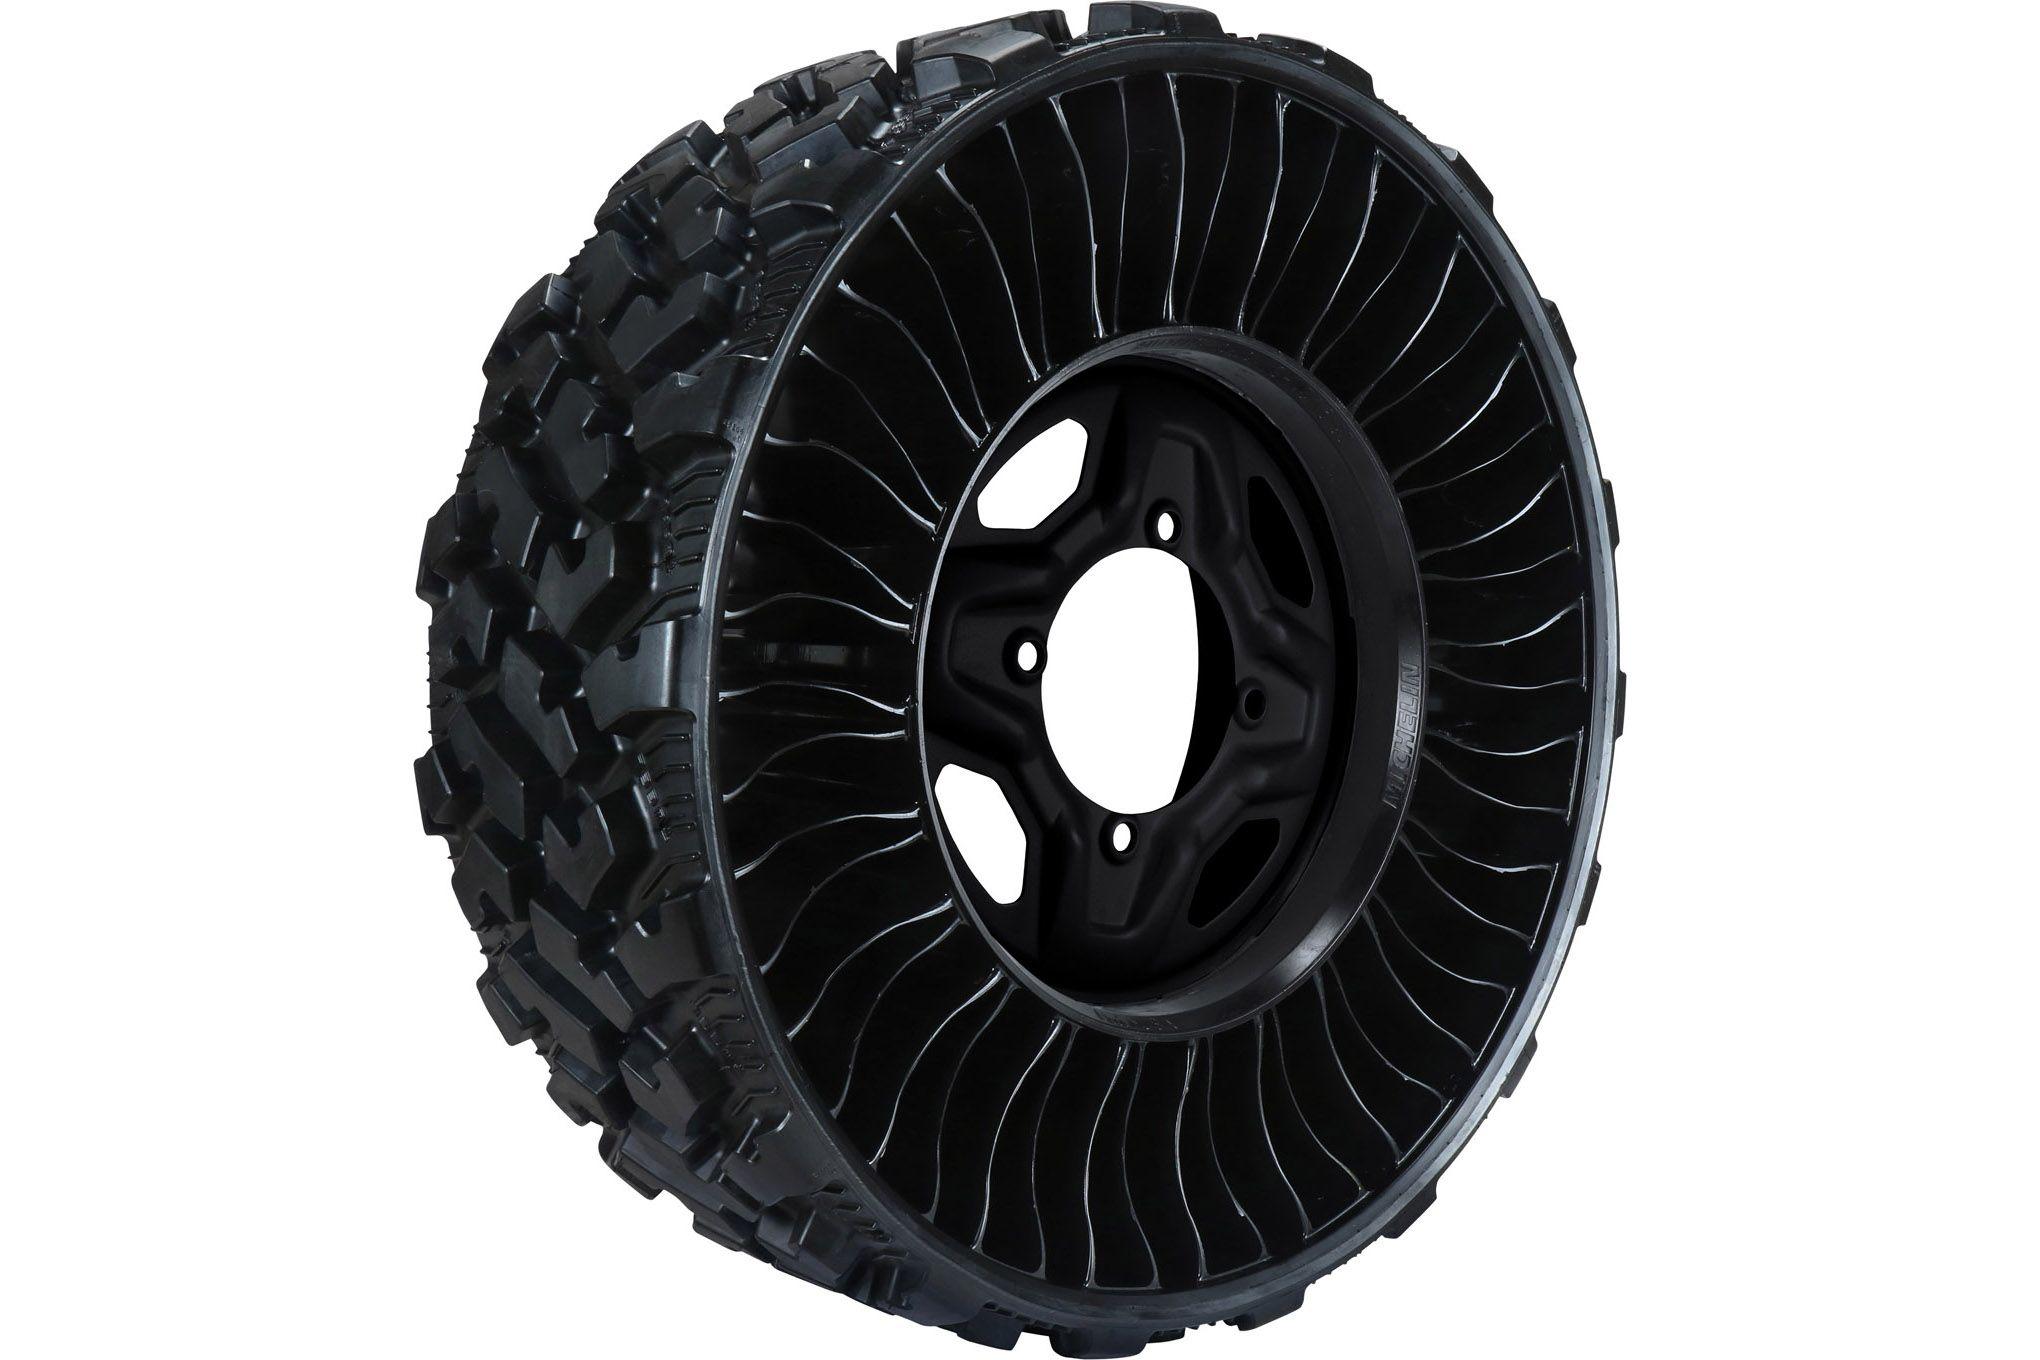 michelin-tire-airless-radial-tire Michelin lanseaza noua anvelopa fara aer pentru piata de UTV-uri